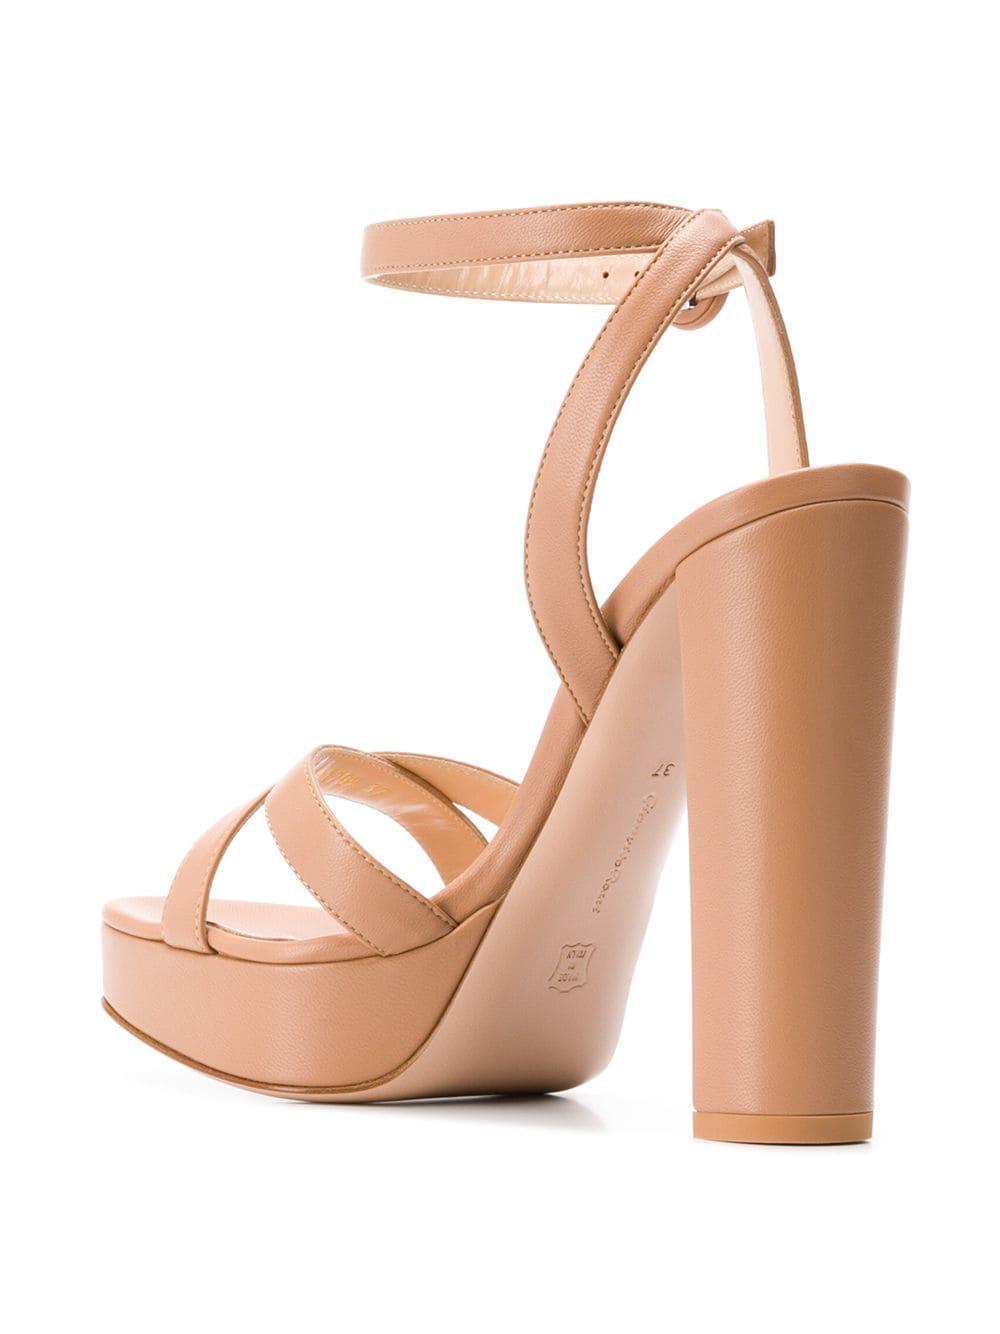 ea0aad2f26d7 Gianvito Rossi - Multicolor Poppy Platform Sandals - Lyst. View fullscreen